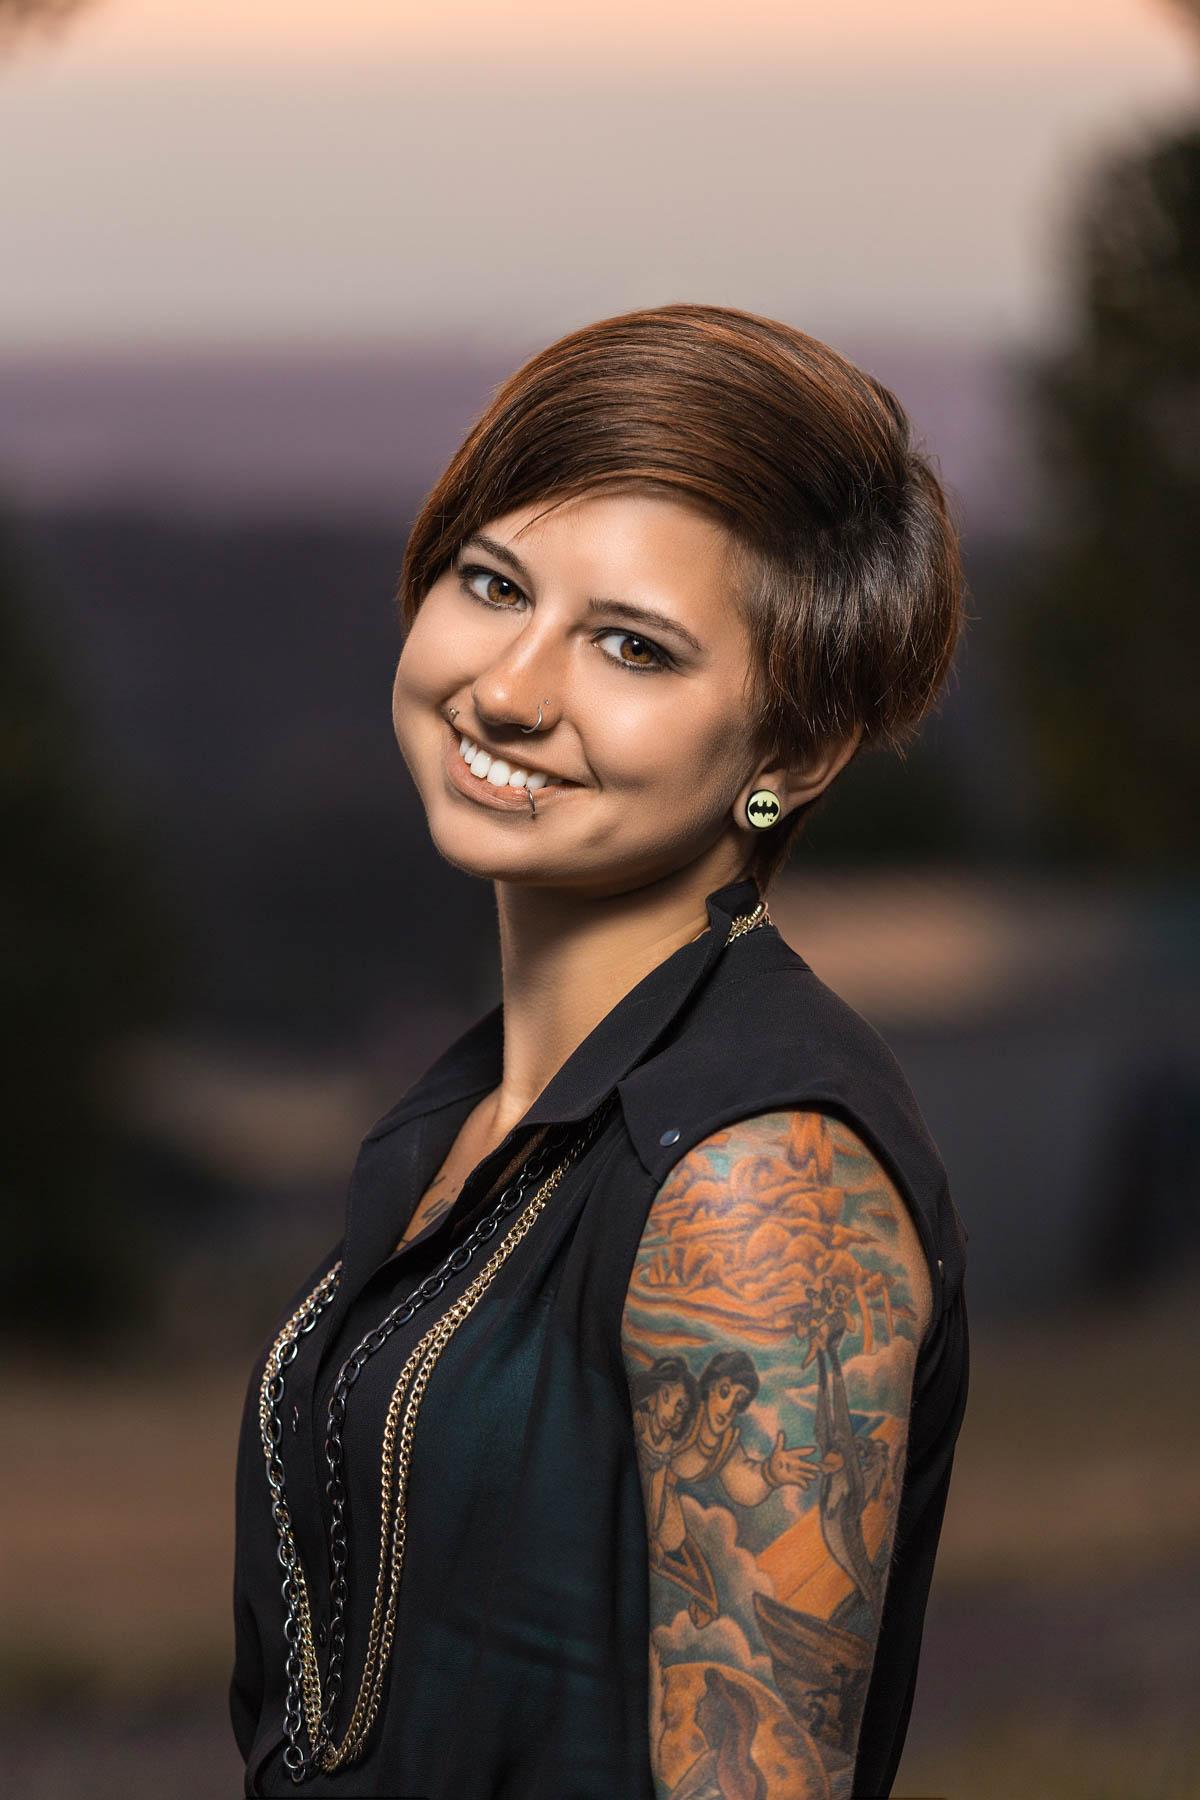 spokane-photographer-chris-thompson-photography-012